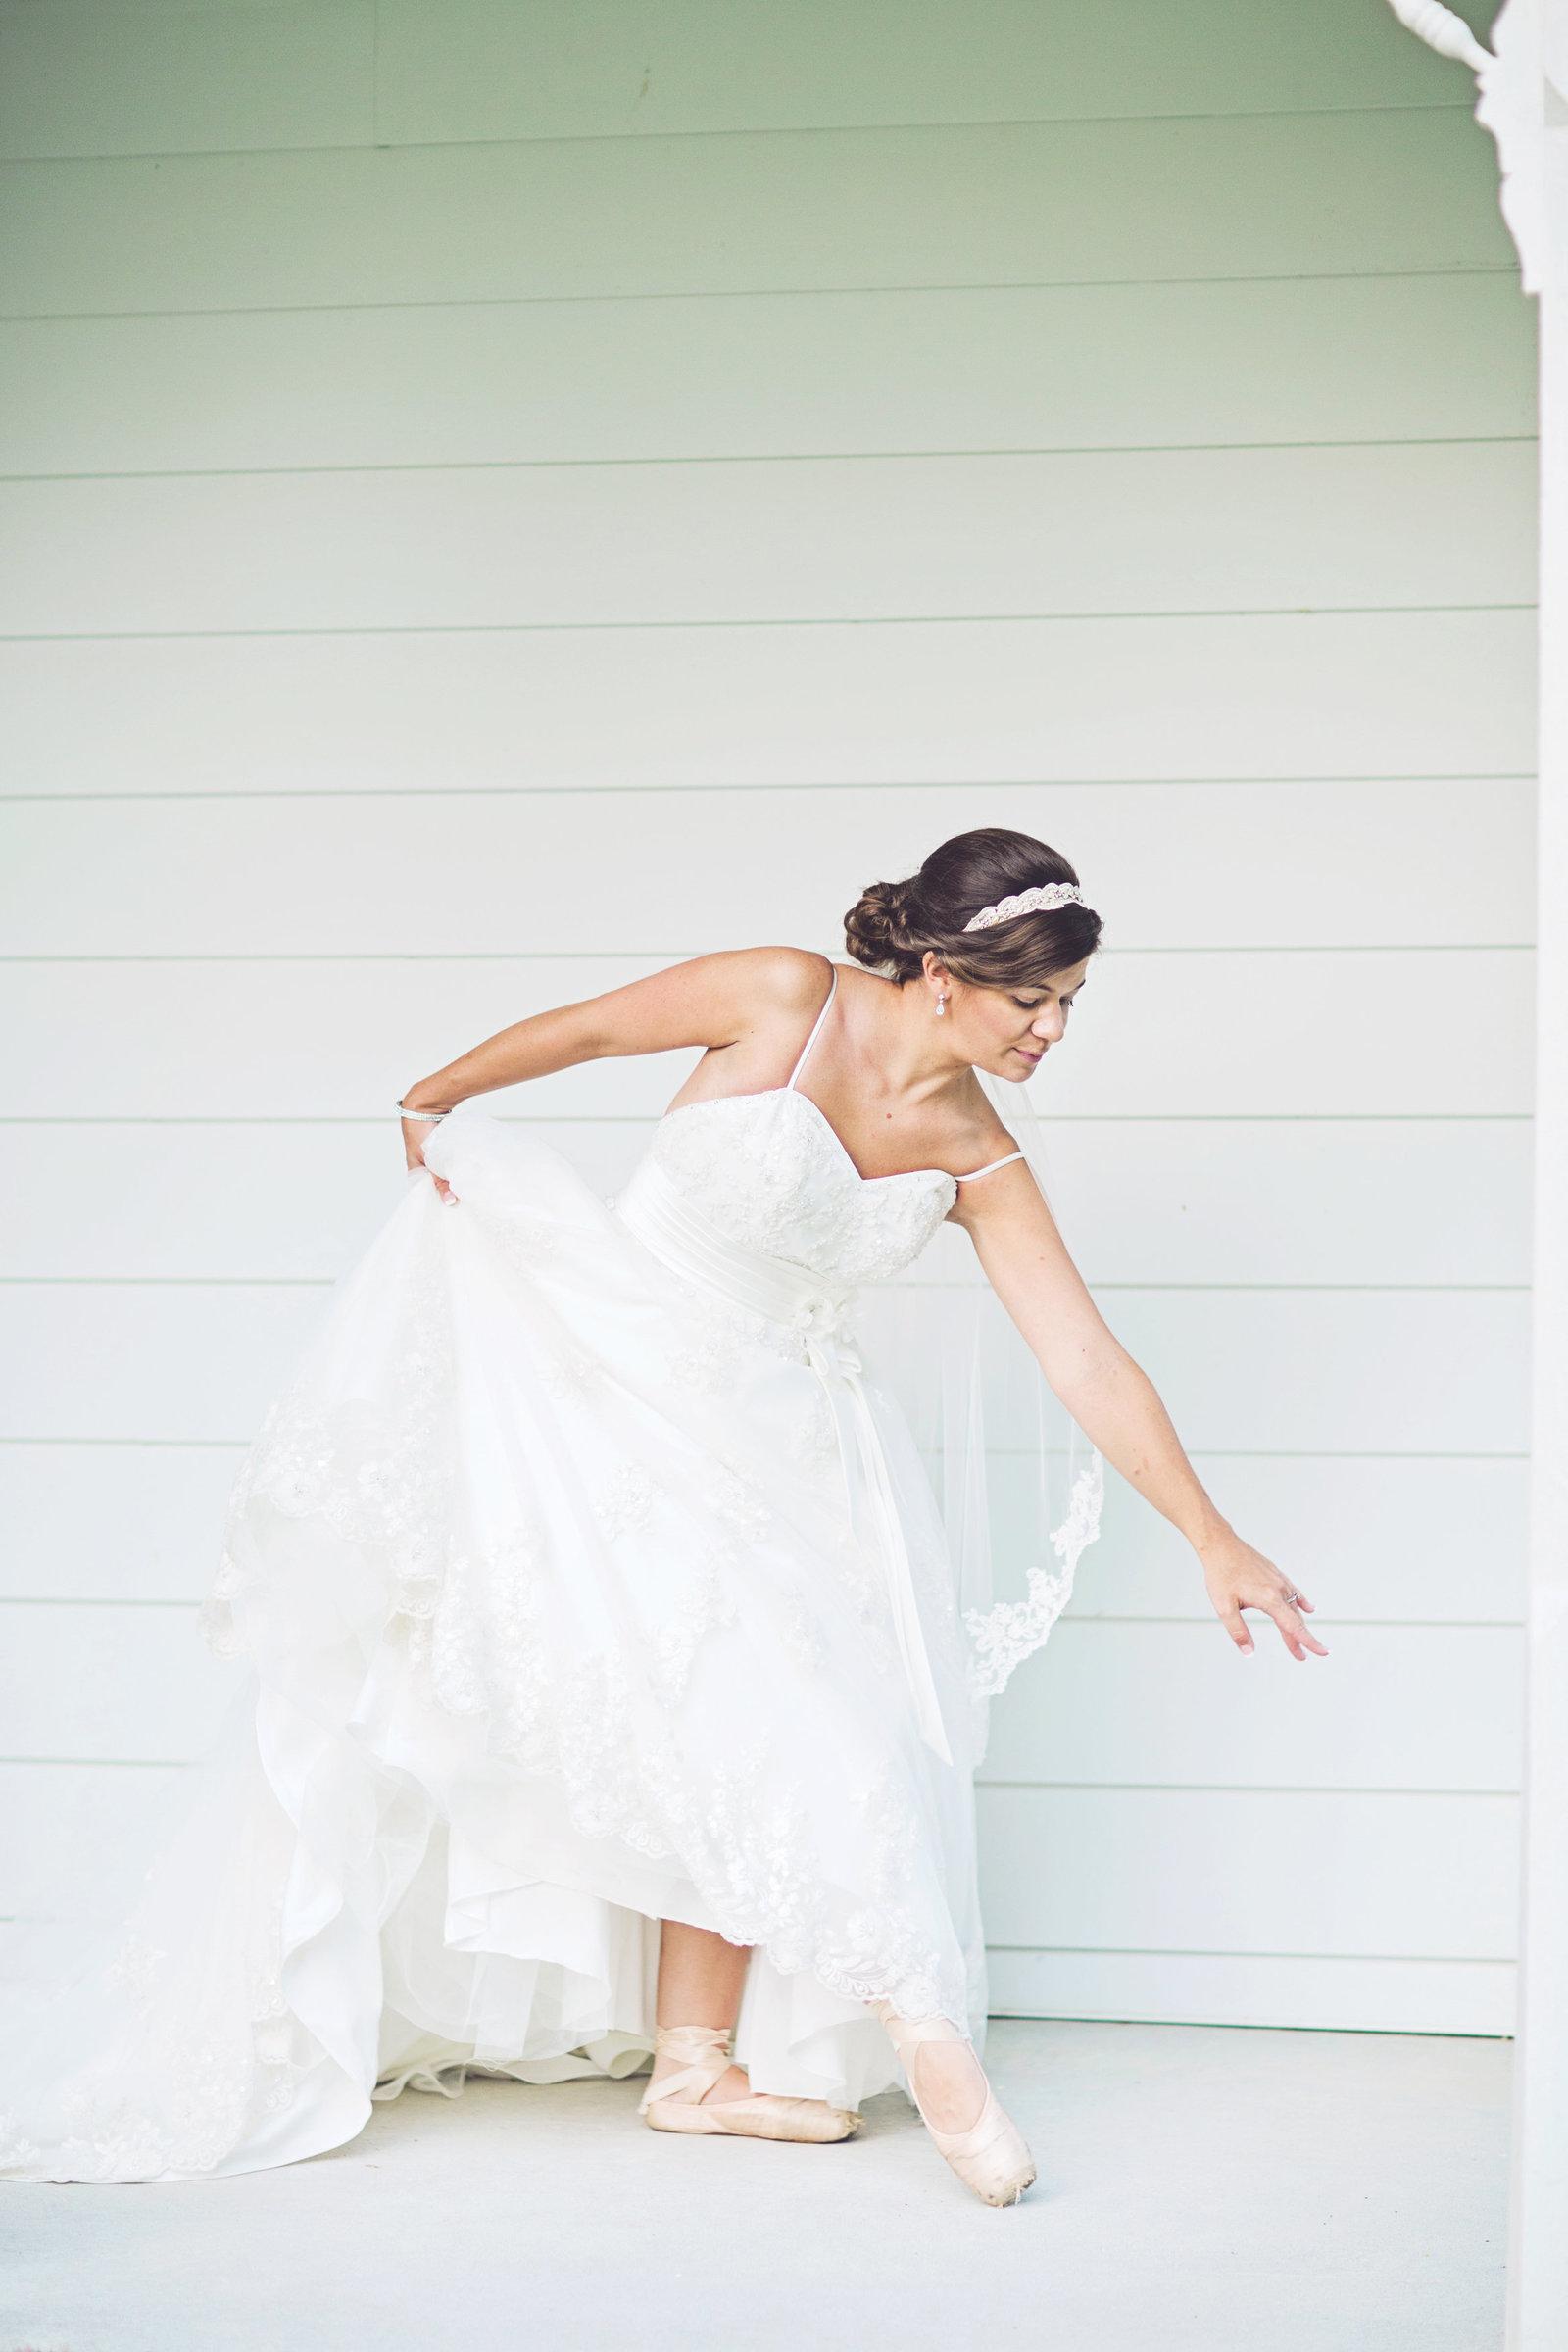 bridal portrait skyryder engagement wedding photography blacksburg roanoke charlottesville lexington radford-005